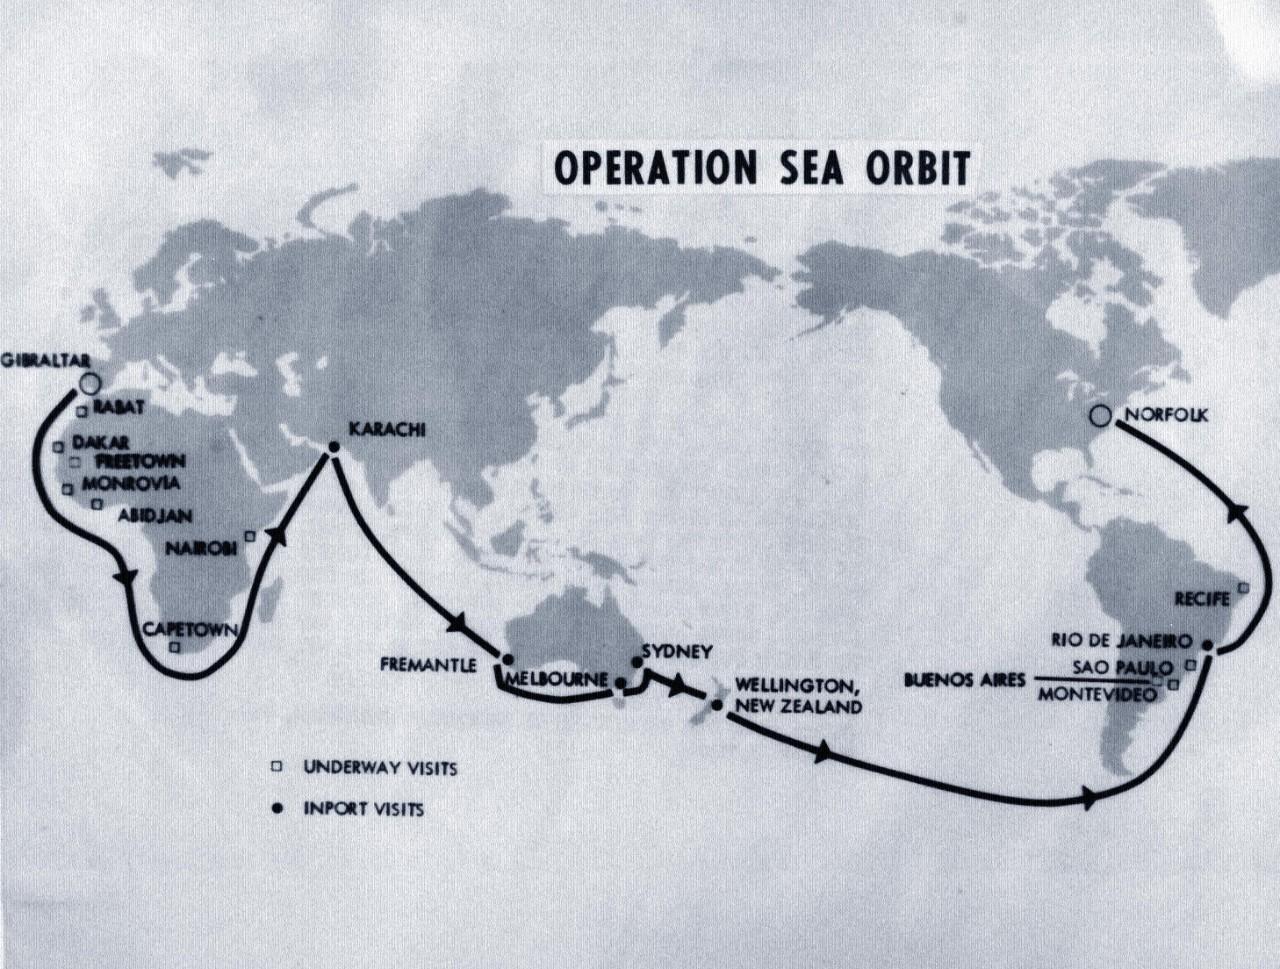 330-PSA-211-64 (USN 711474): Operation Sea Orbit, 1964